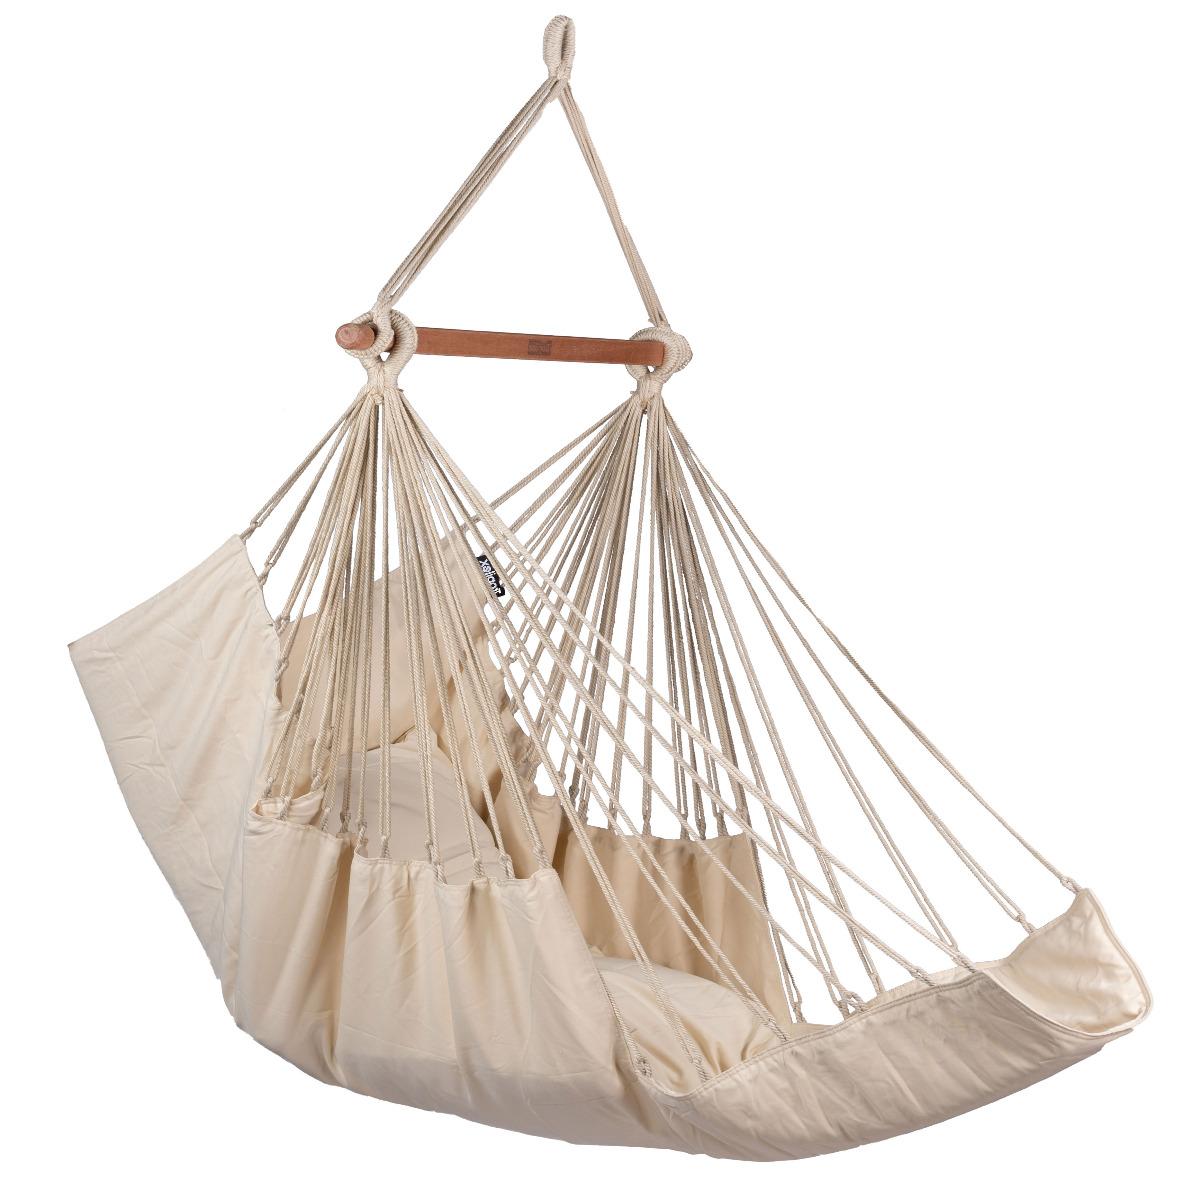 Hangstoel E�npersoons 'Sereno' White - Wit - Ecru - Tropilex �